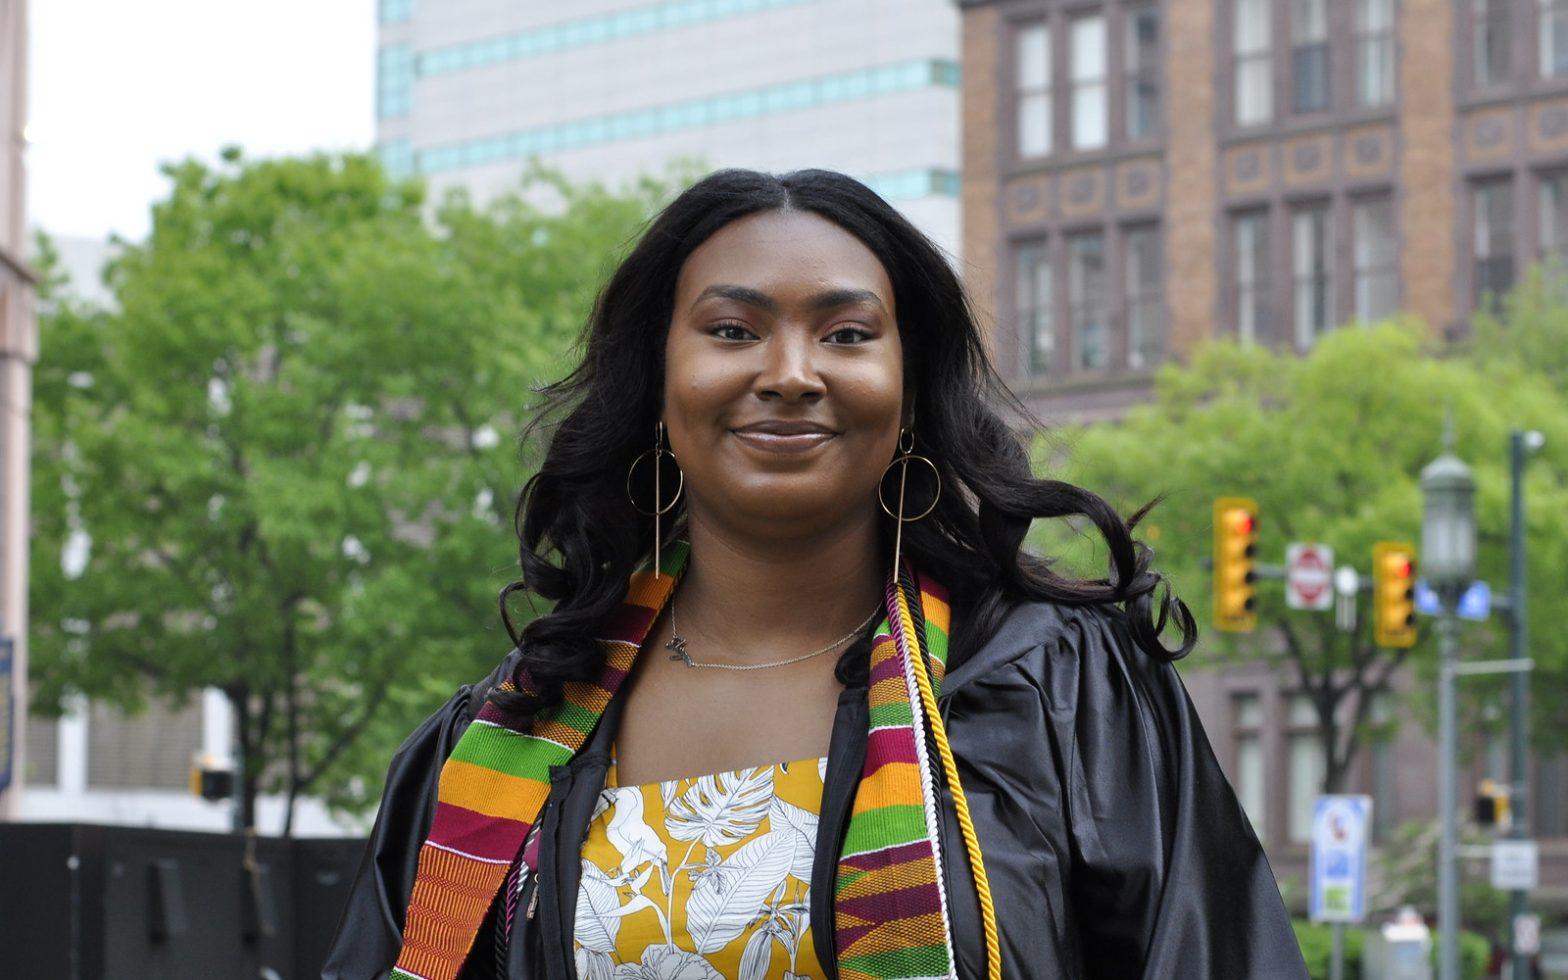 Morgan Littleford receives Central Penn College's Student Leadership Award